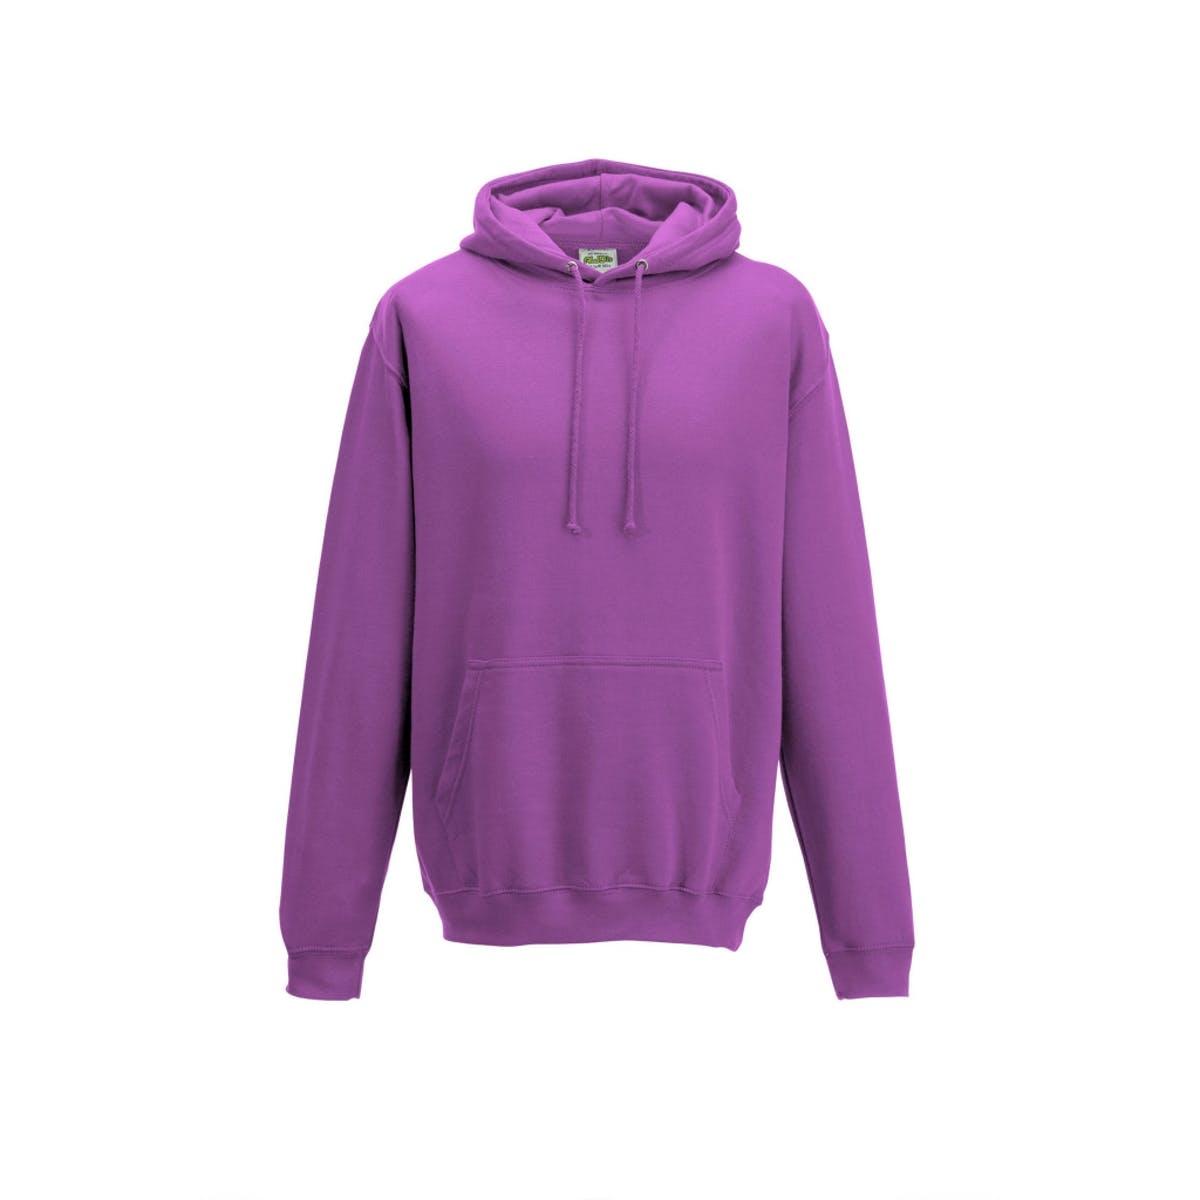 pinky purple college hoodies